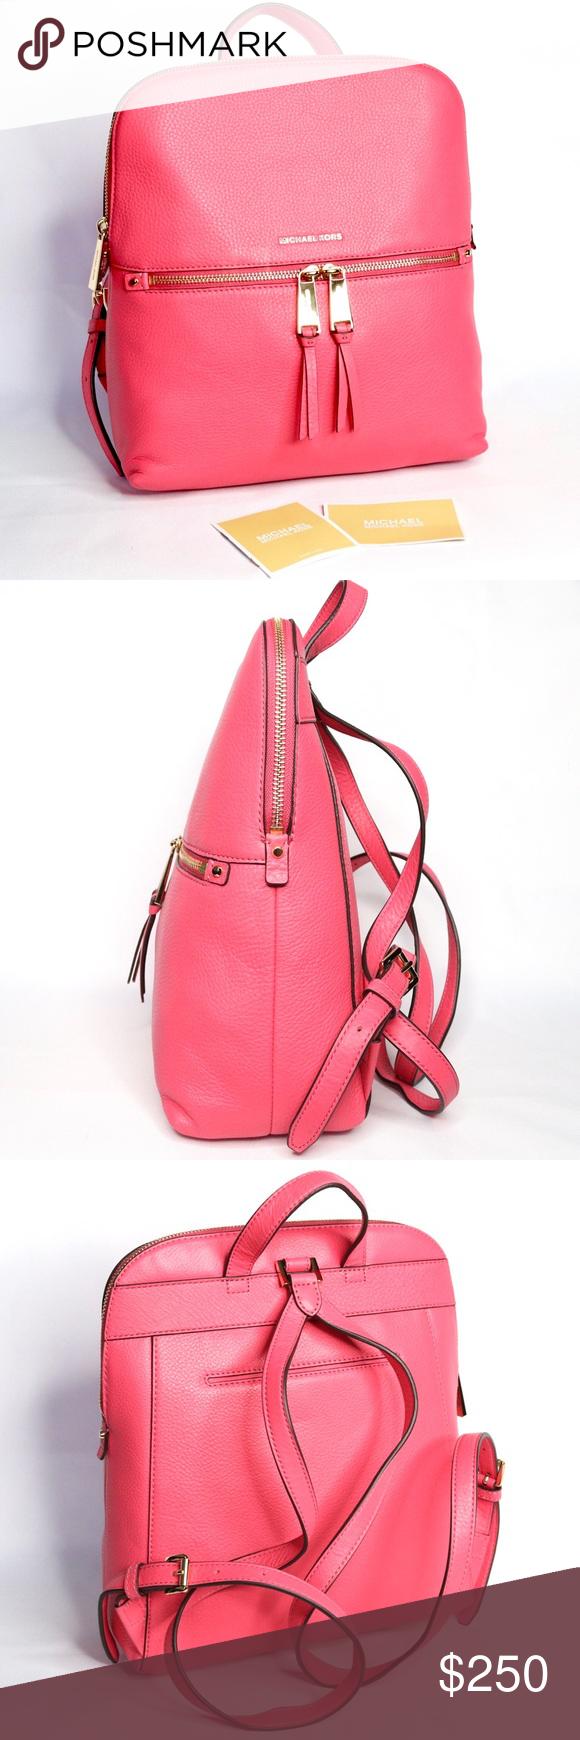 1c1da4a1c7faa6 NWT Michael Kors Rhea Rose Pink Slim Backpack Beautiful & brand new Michael  Kors Slim Rhea Backpack. Features: • 100% Leather - Rose Pink Color •  Gold-Tone ...